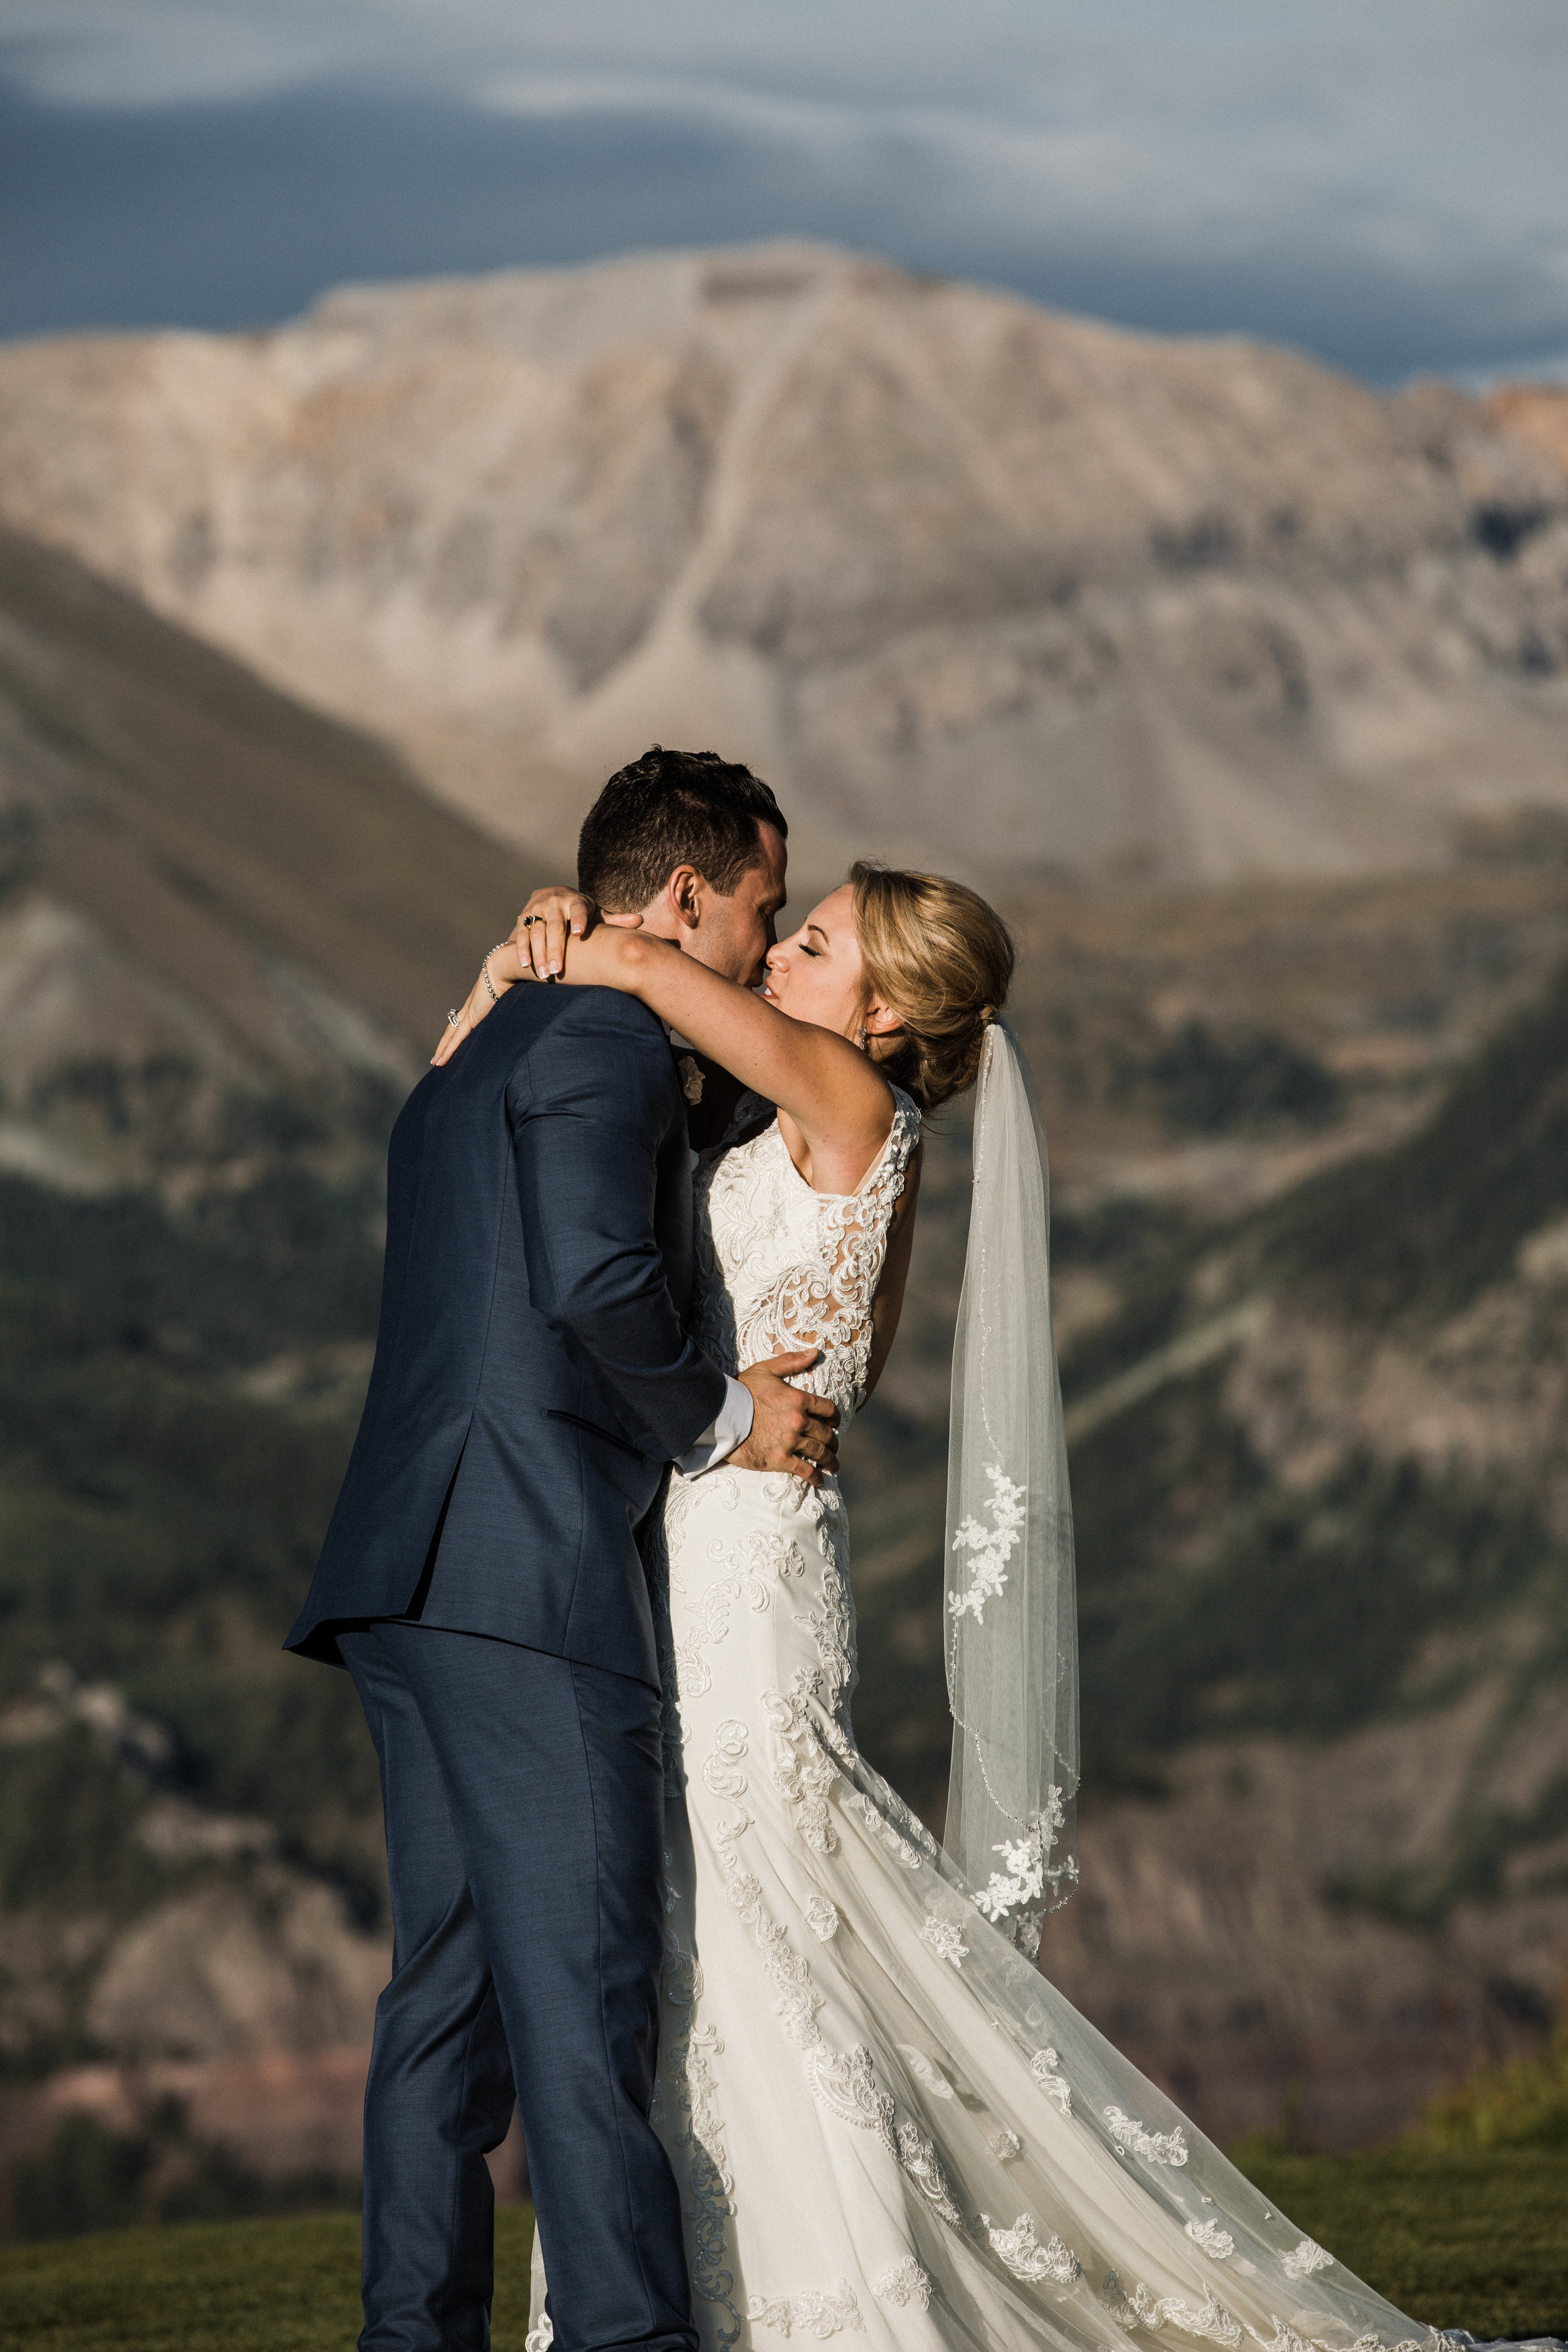 leahandashton-telluride-wedding-photography-0077.jpg